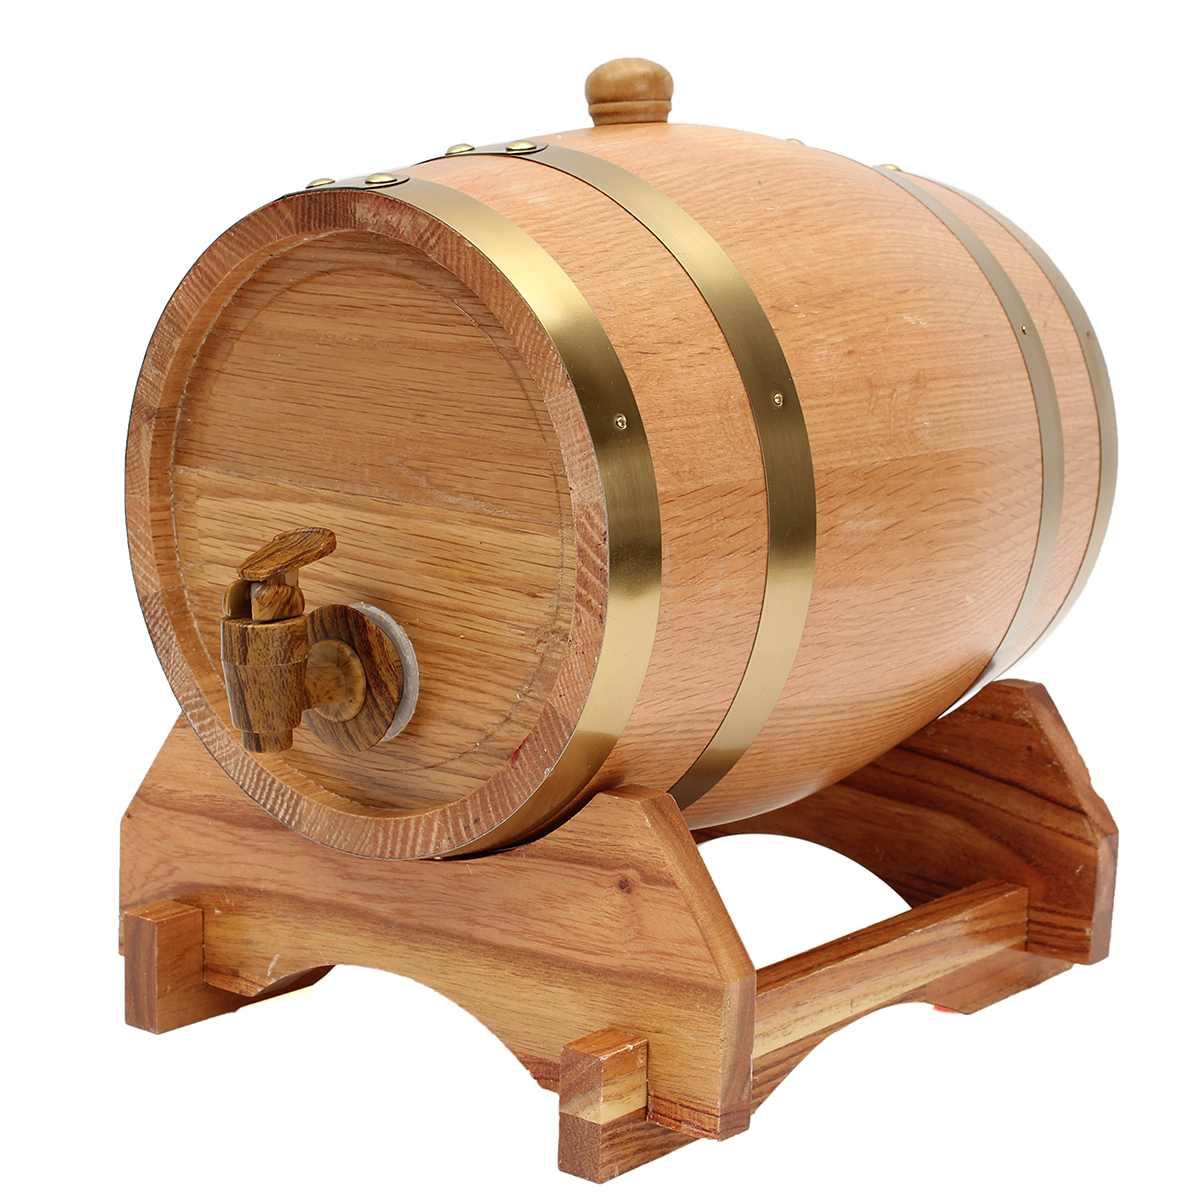 Barril de cerveza de 5L, barril de vino de madera de roble de estilo antiguo, barril de vino para whisky, barril decorativo de puerto de ron, barril para Hotel, restaurante